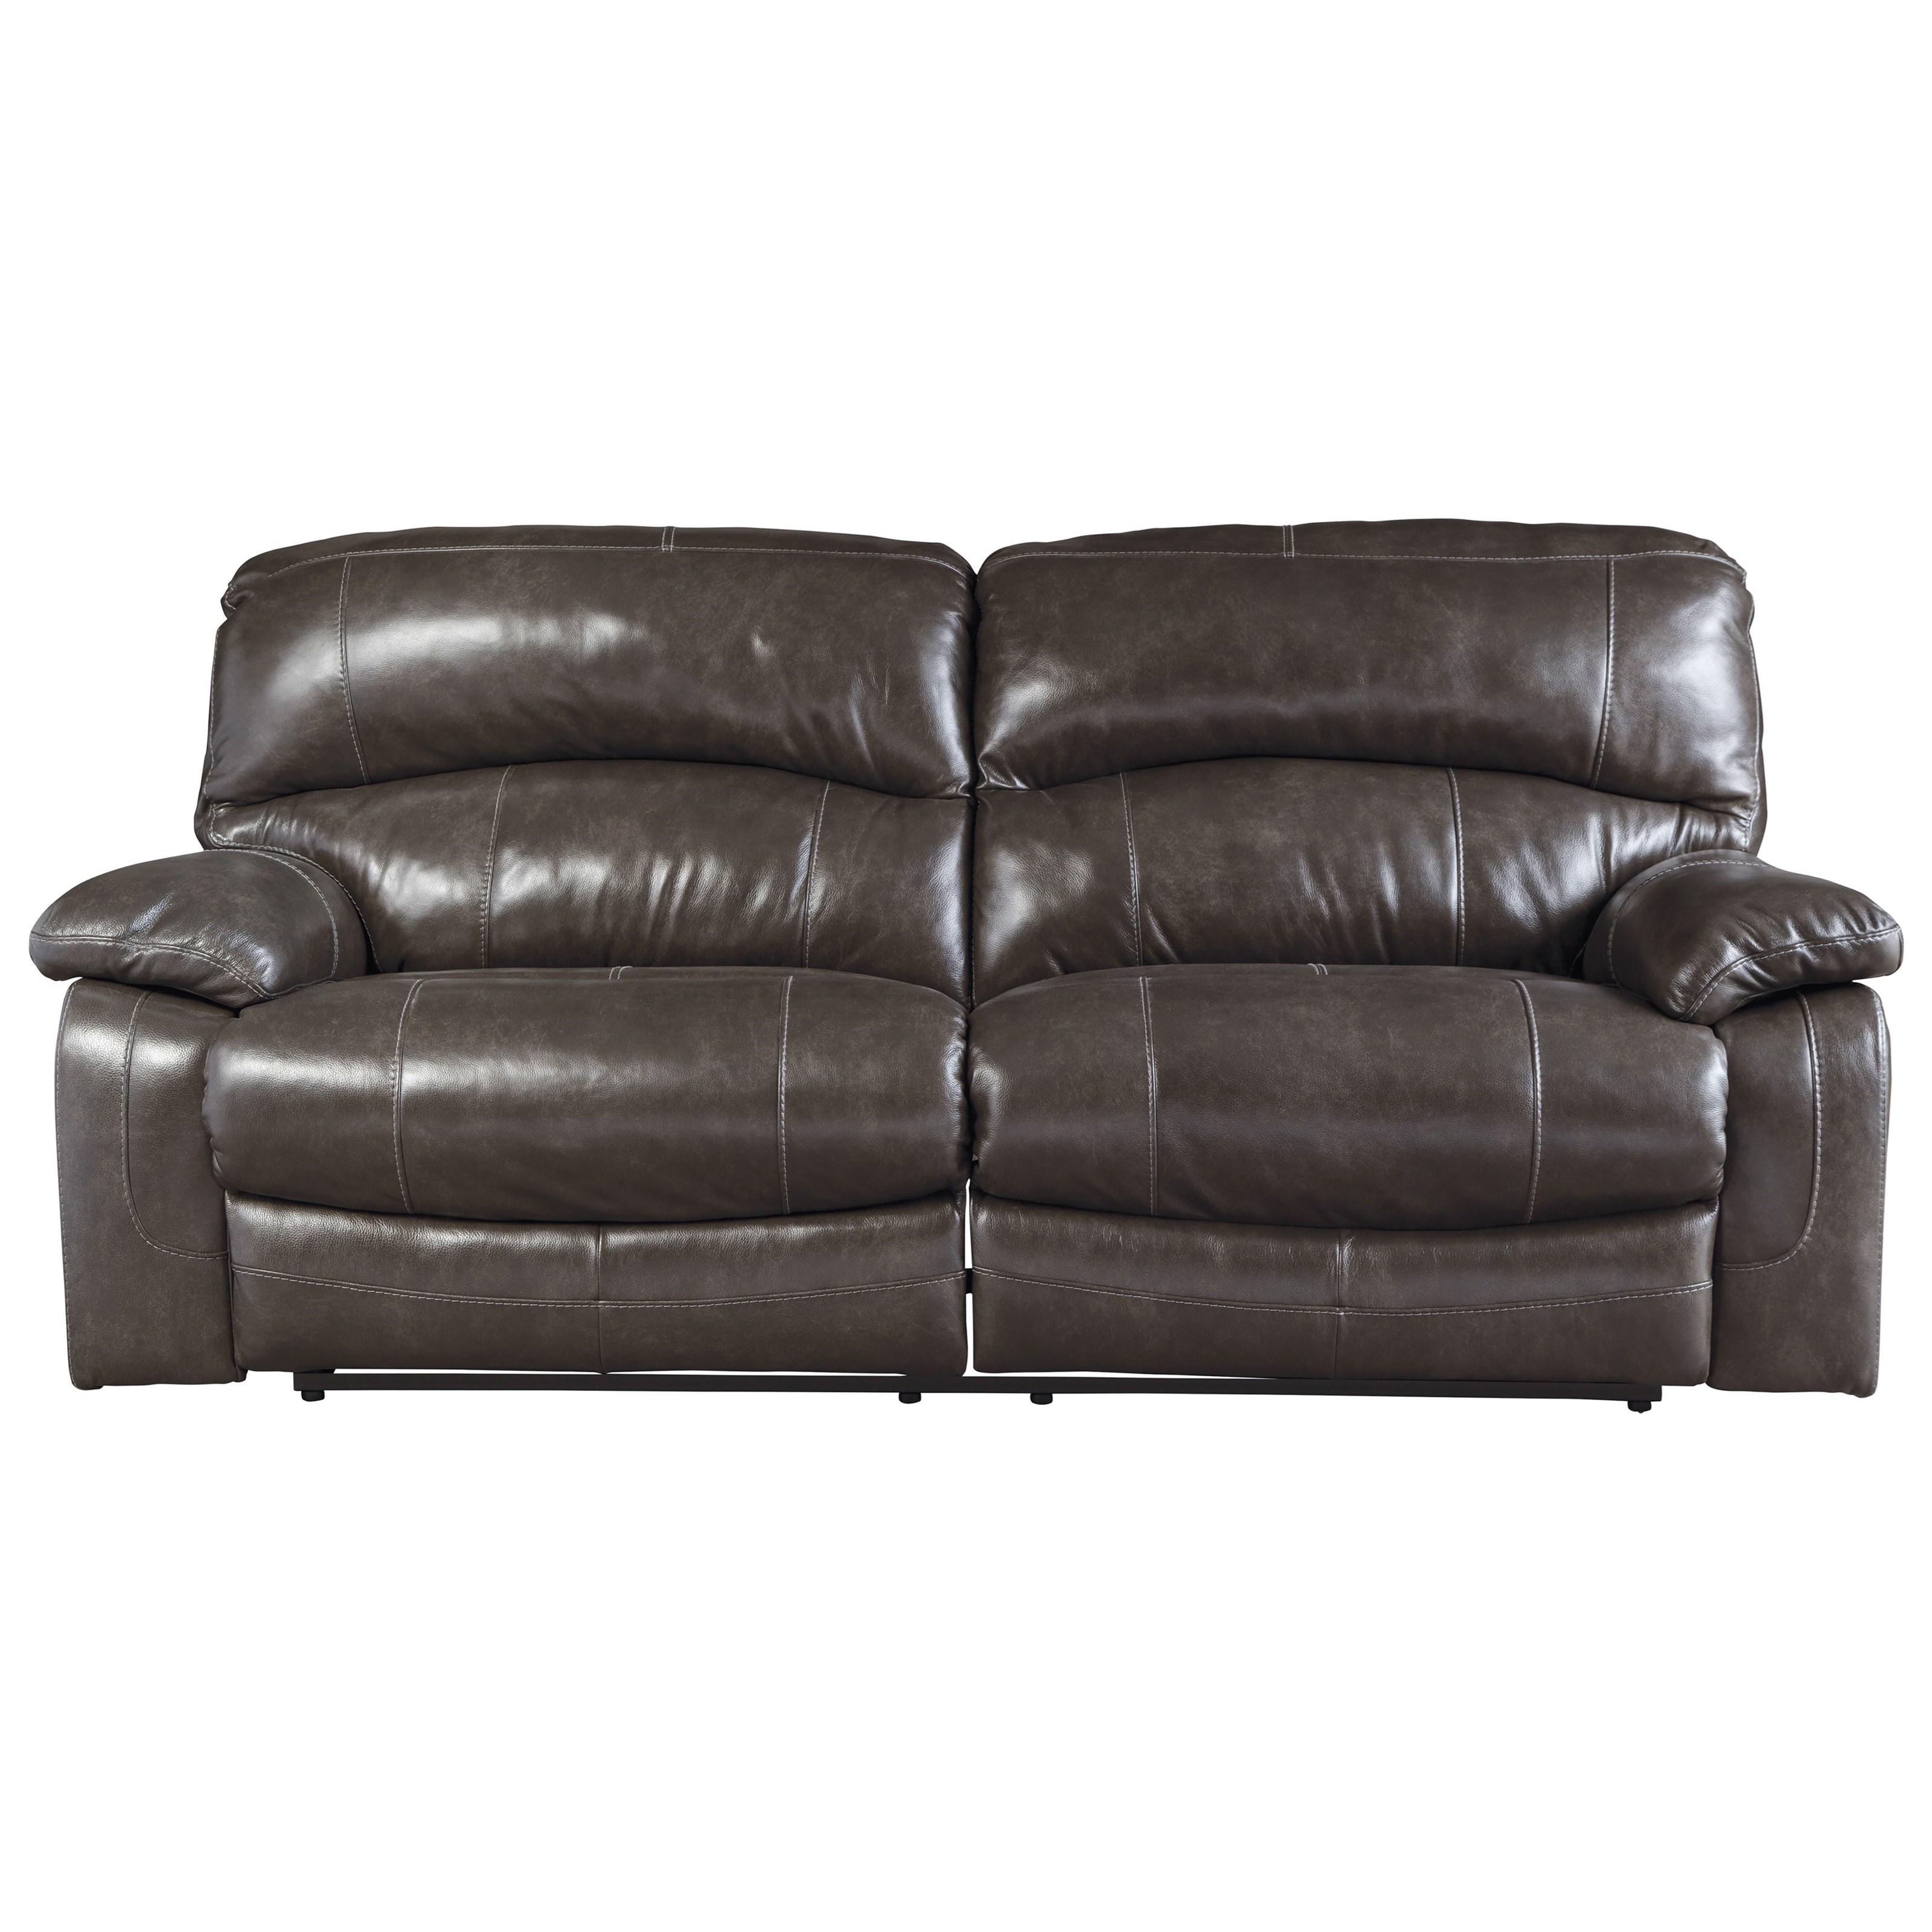 ashley sofa recliners chester bed signature design by damacio metal u9821347